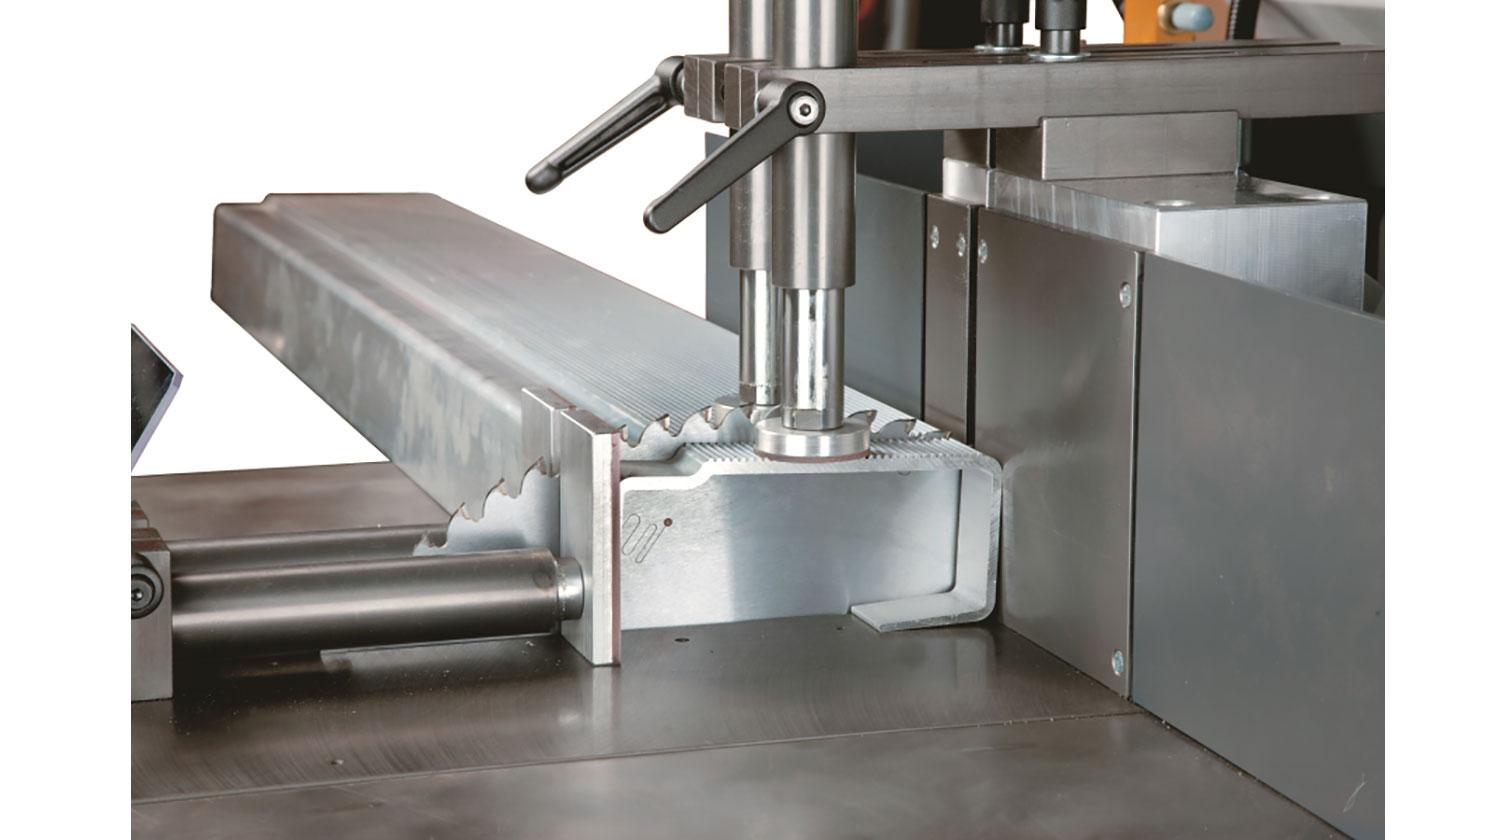 INT aluminum up cut saw Pressta Eisele GS 550 cutting detail